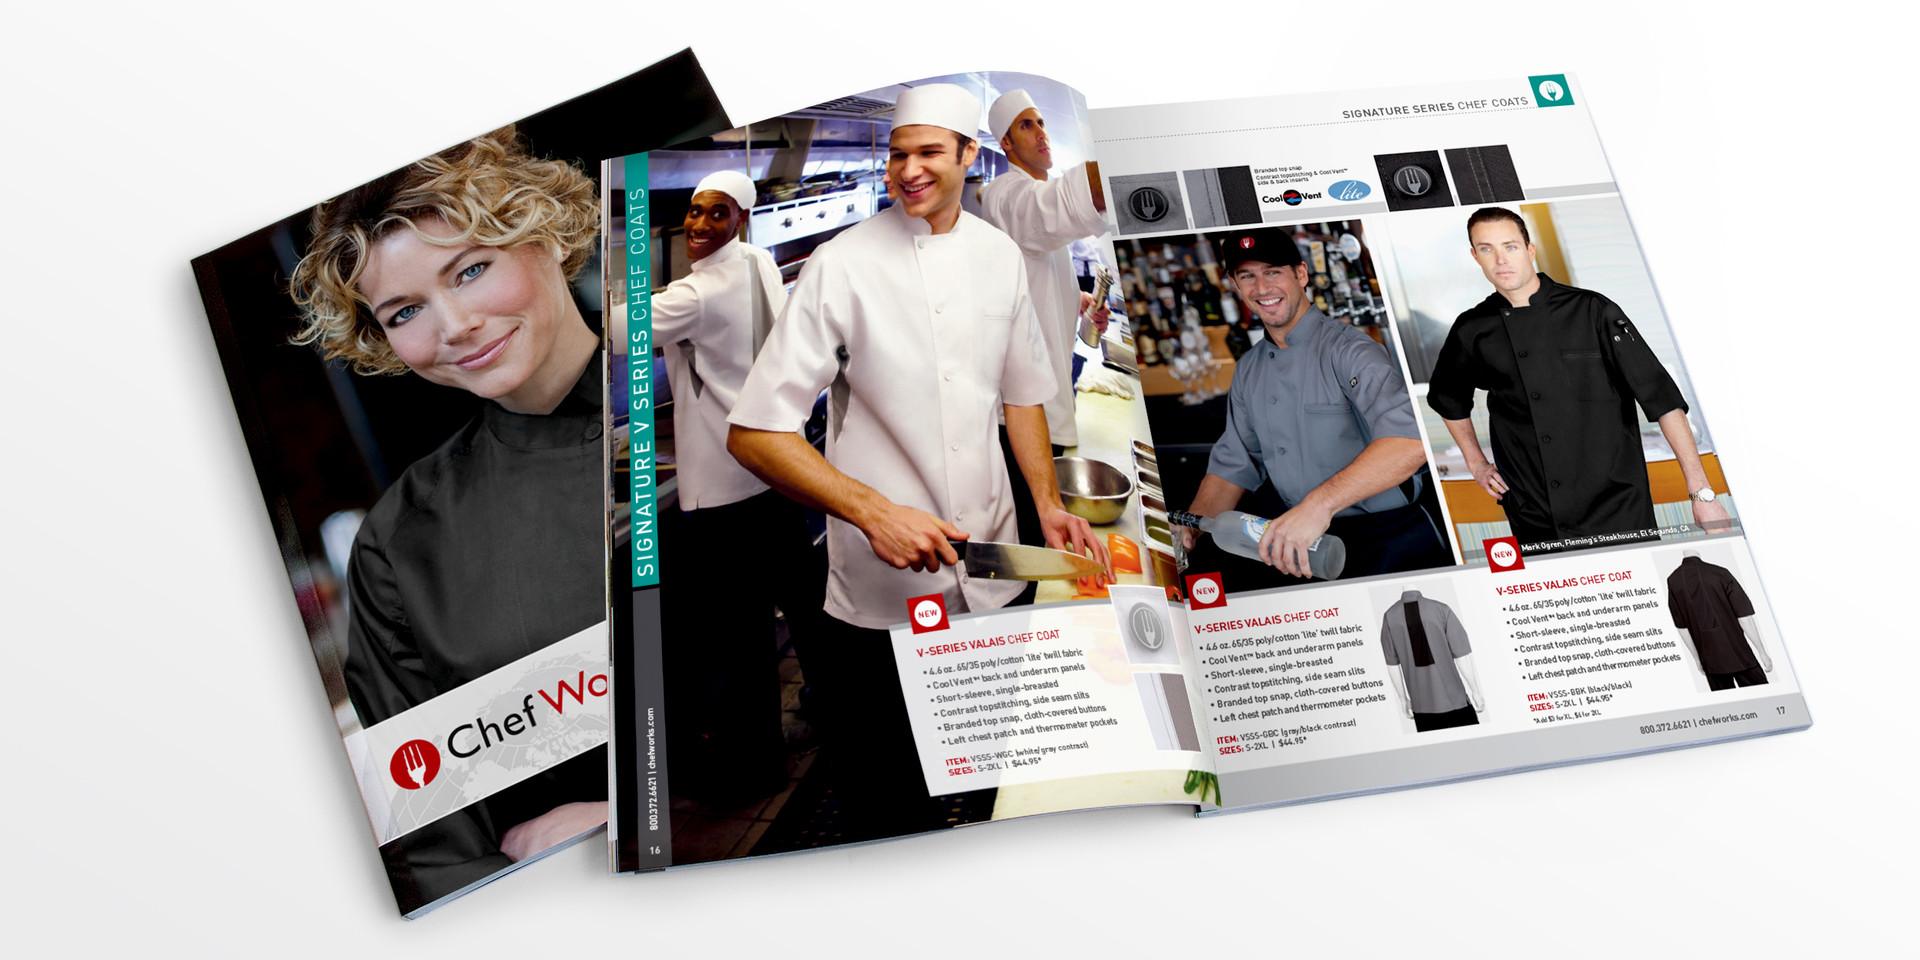 chefworks_03.jpg